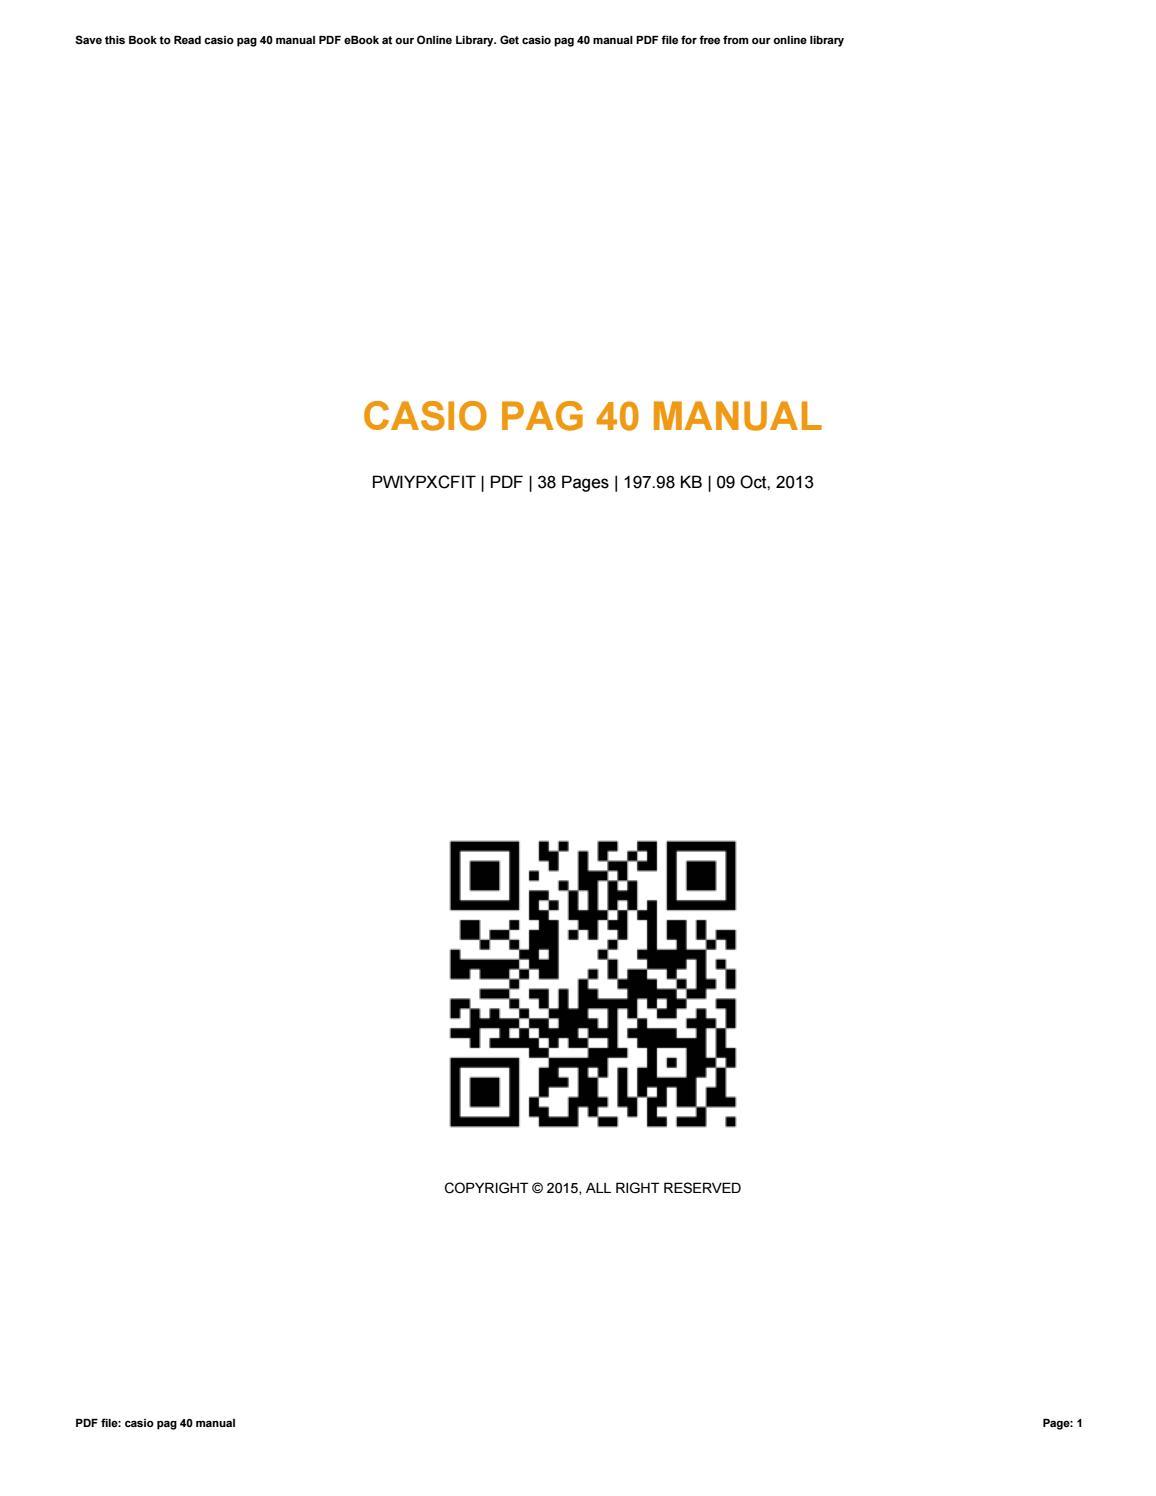 casio pathfinder pag80 1v manual